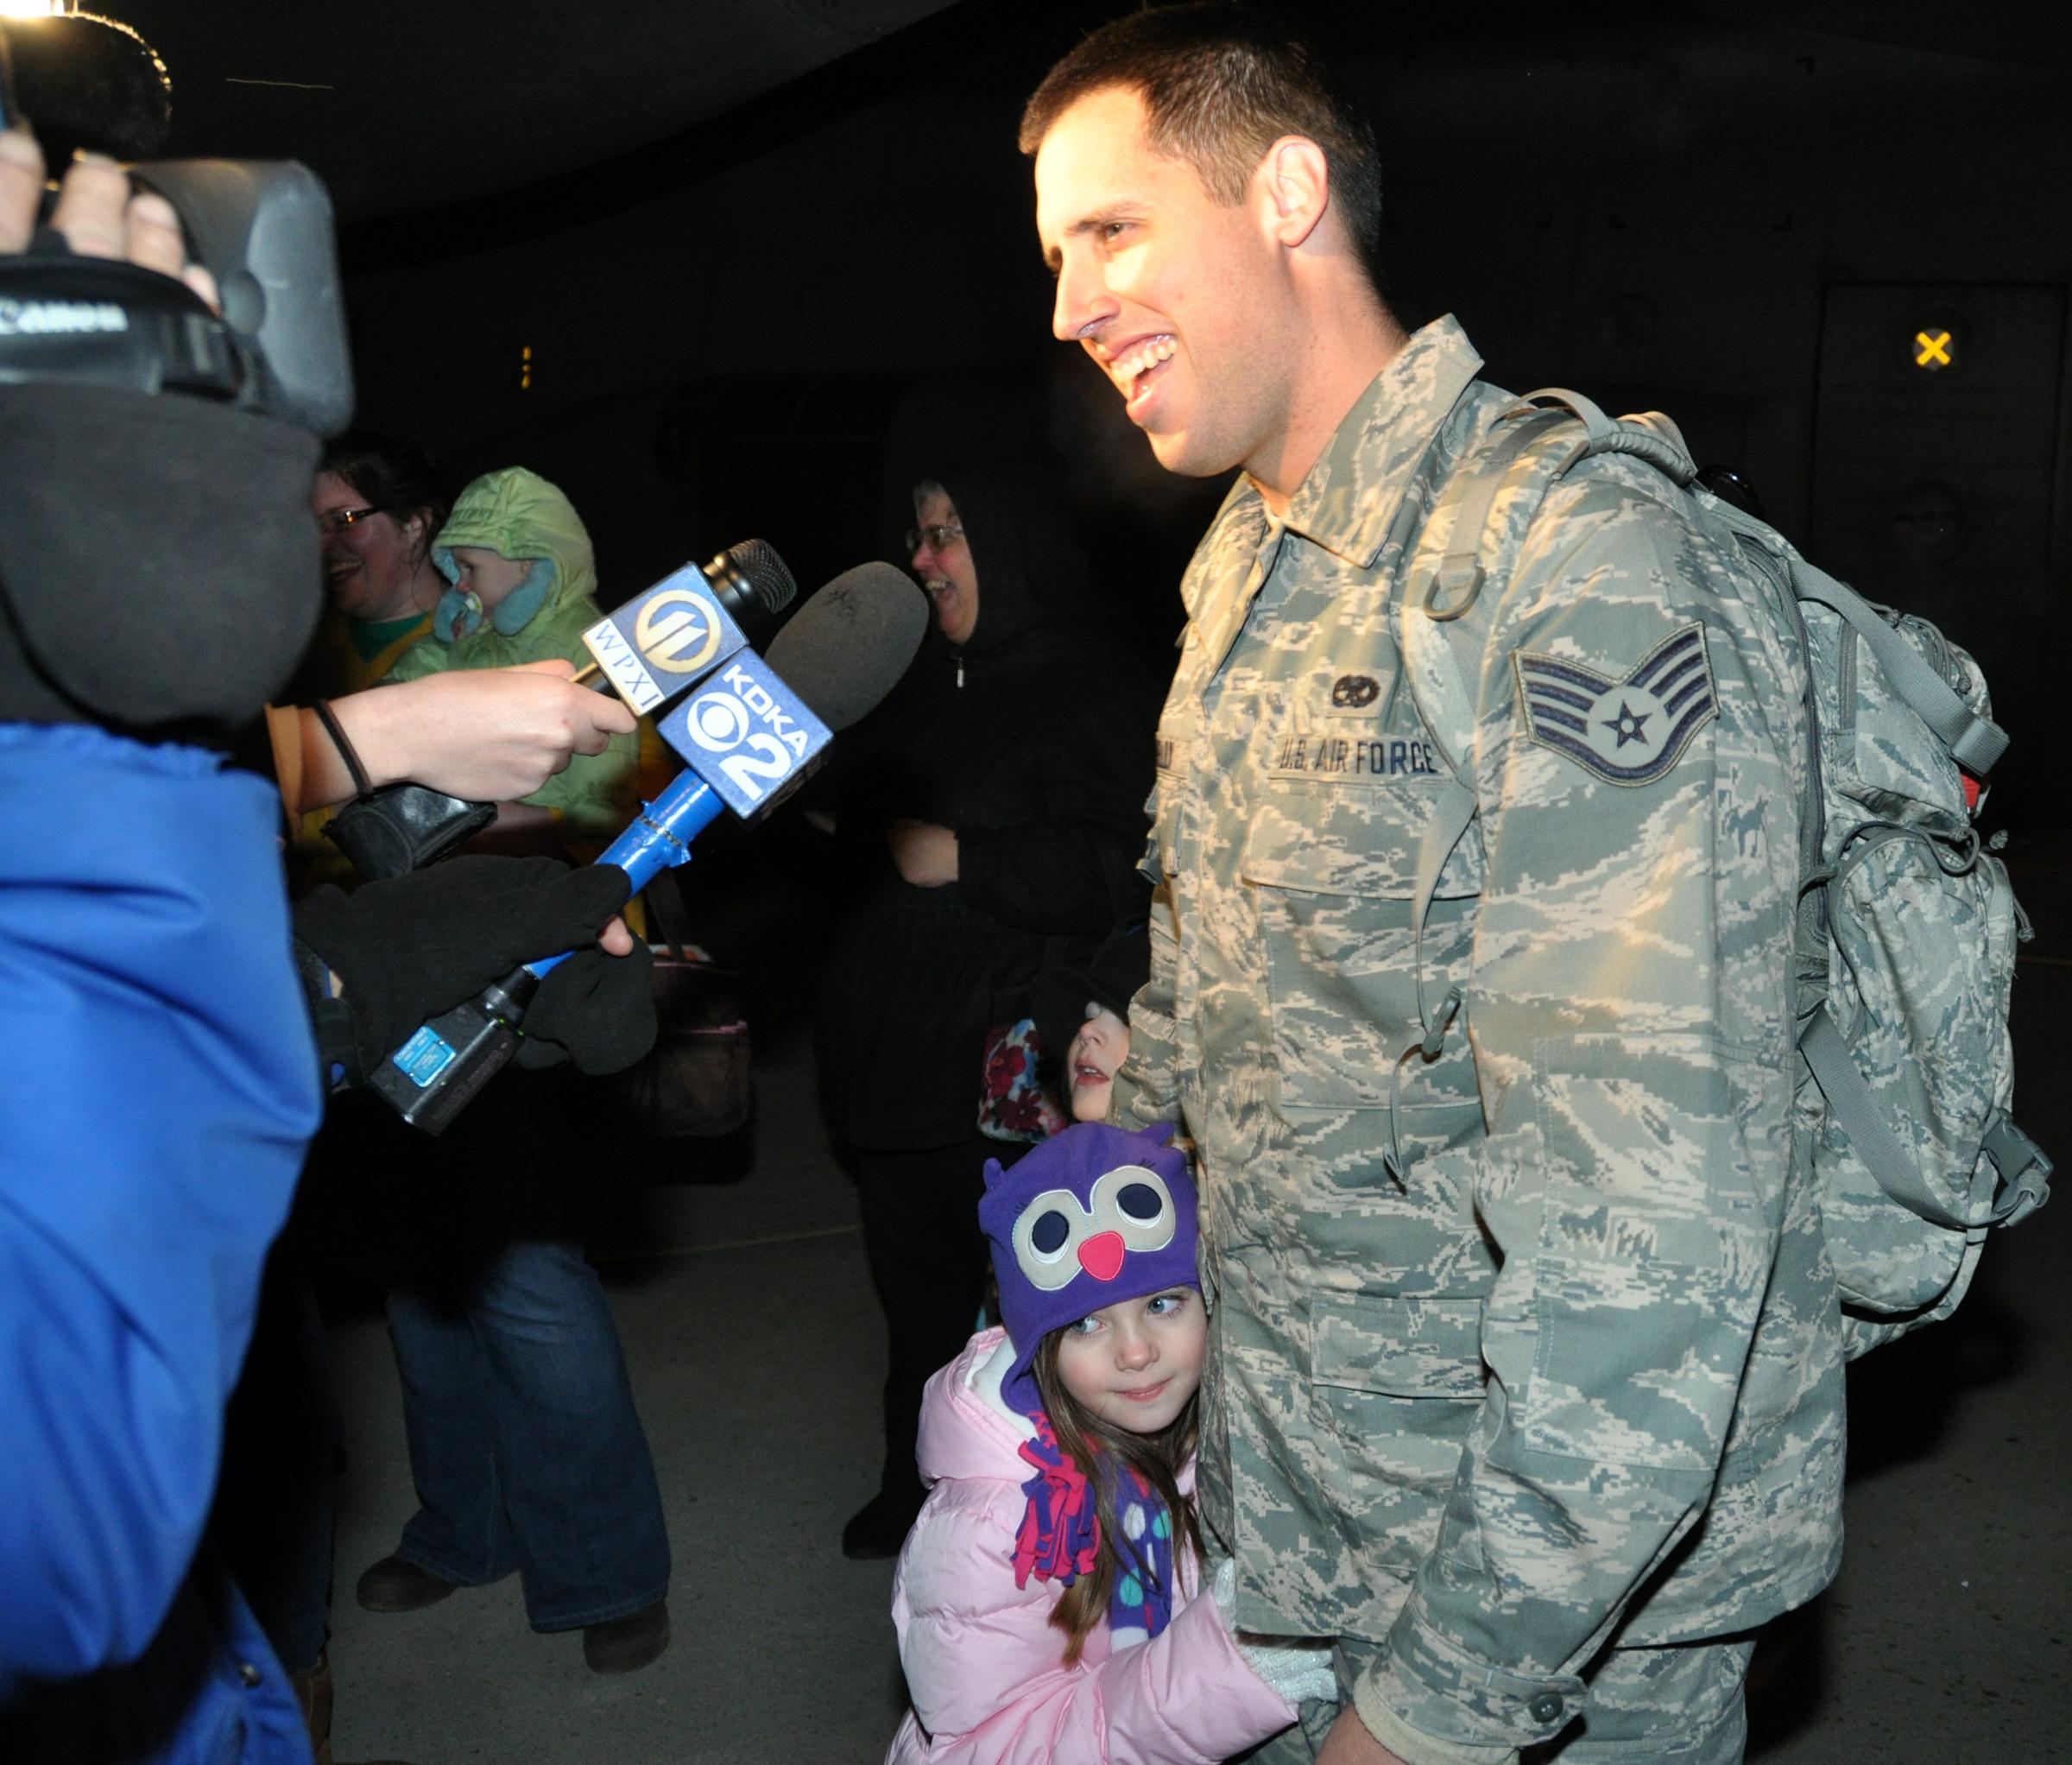 Steel City Airmen wrap-up successful deployment